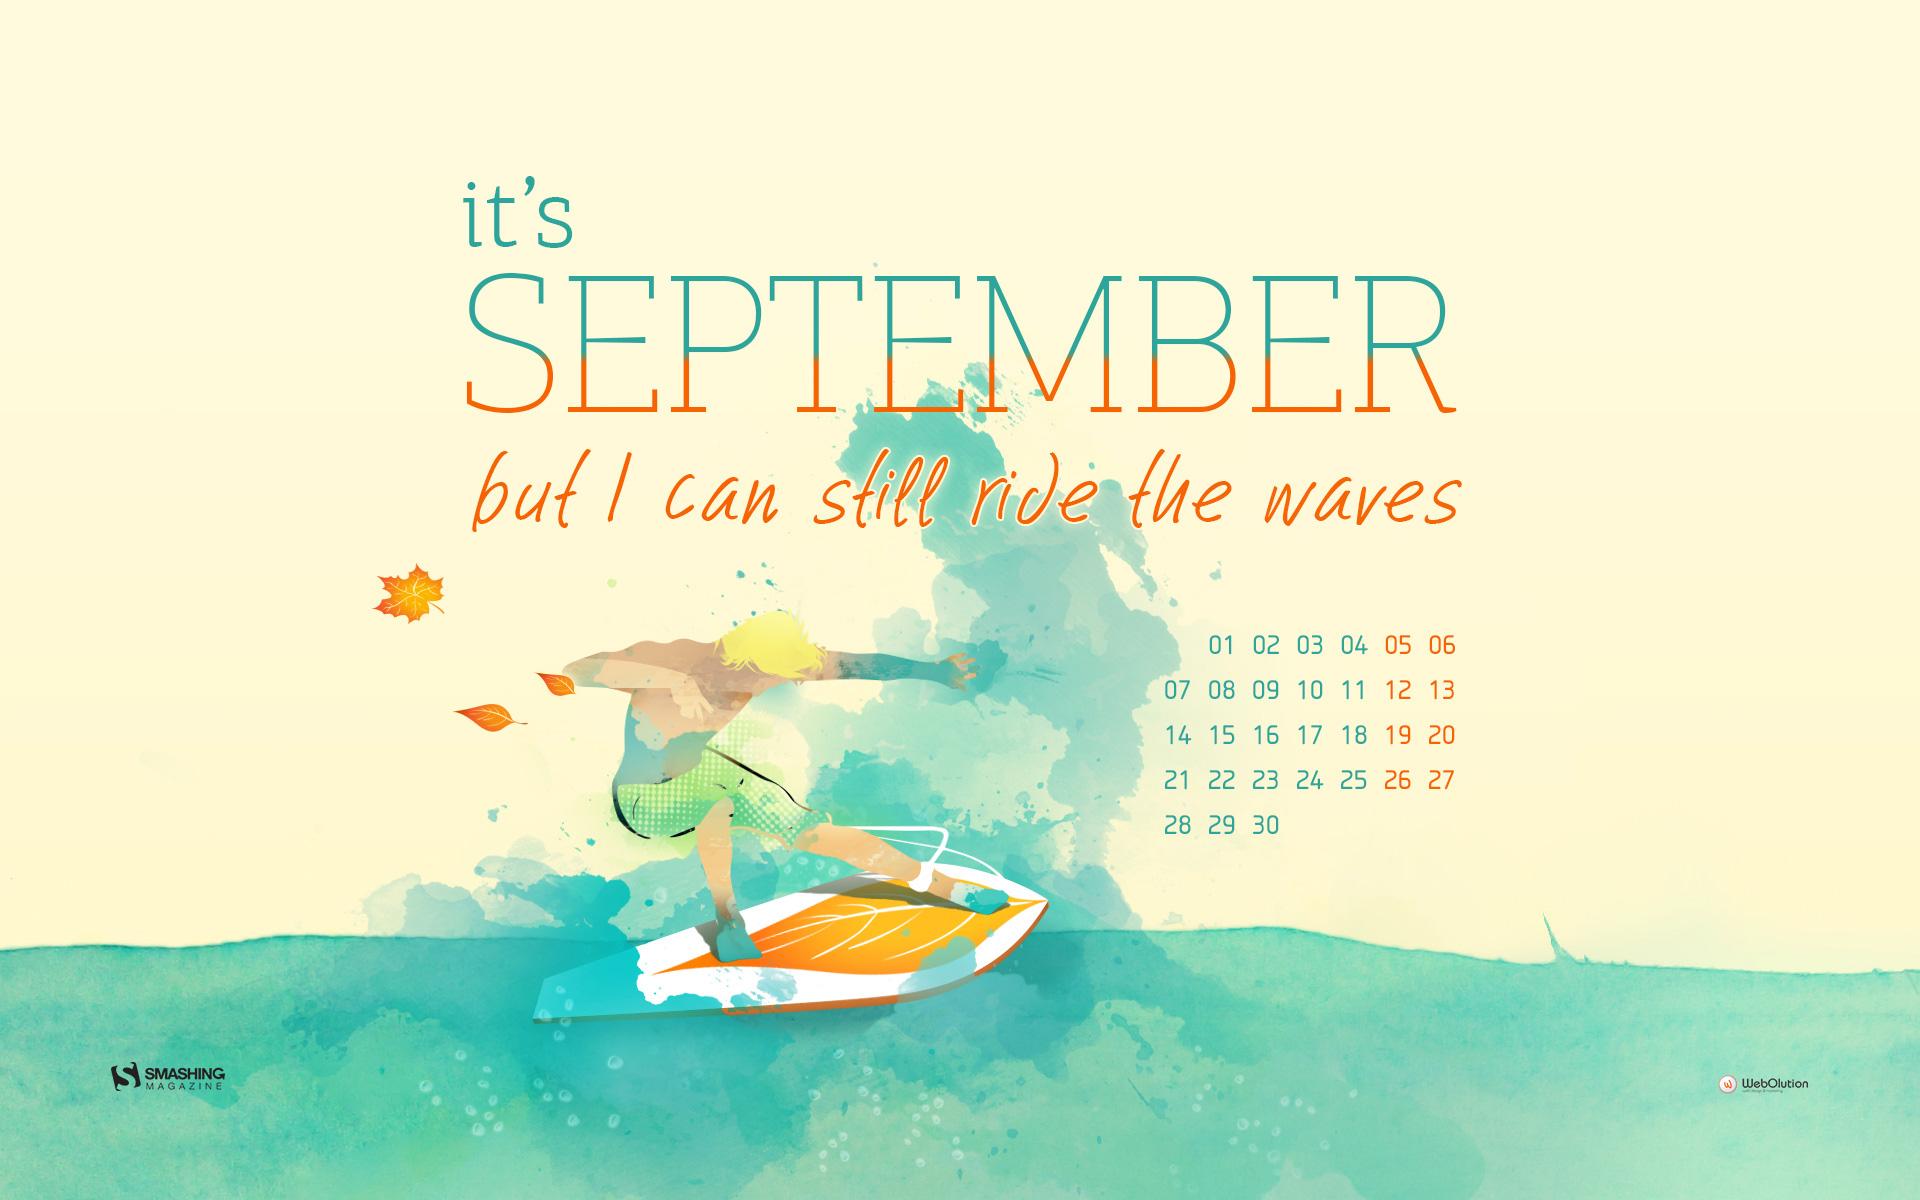 Calendars Wallpapers September 2015 its september but i can still ride 1920x1200